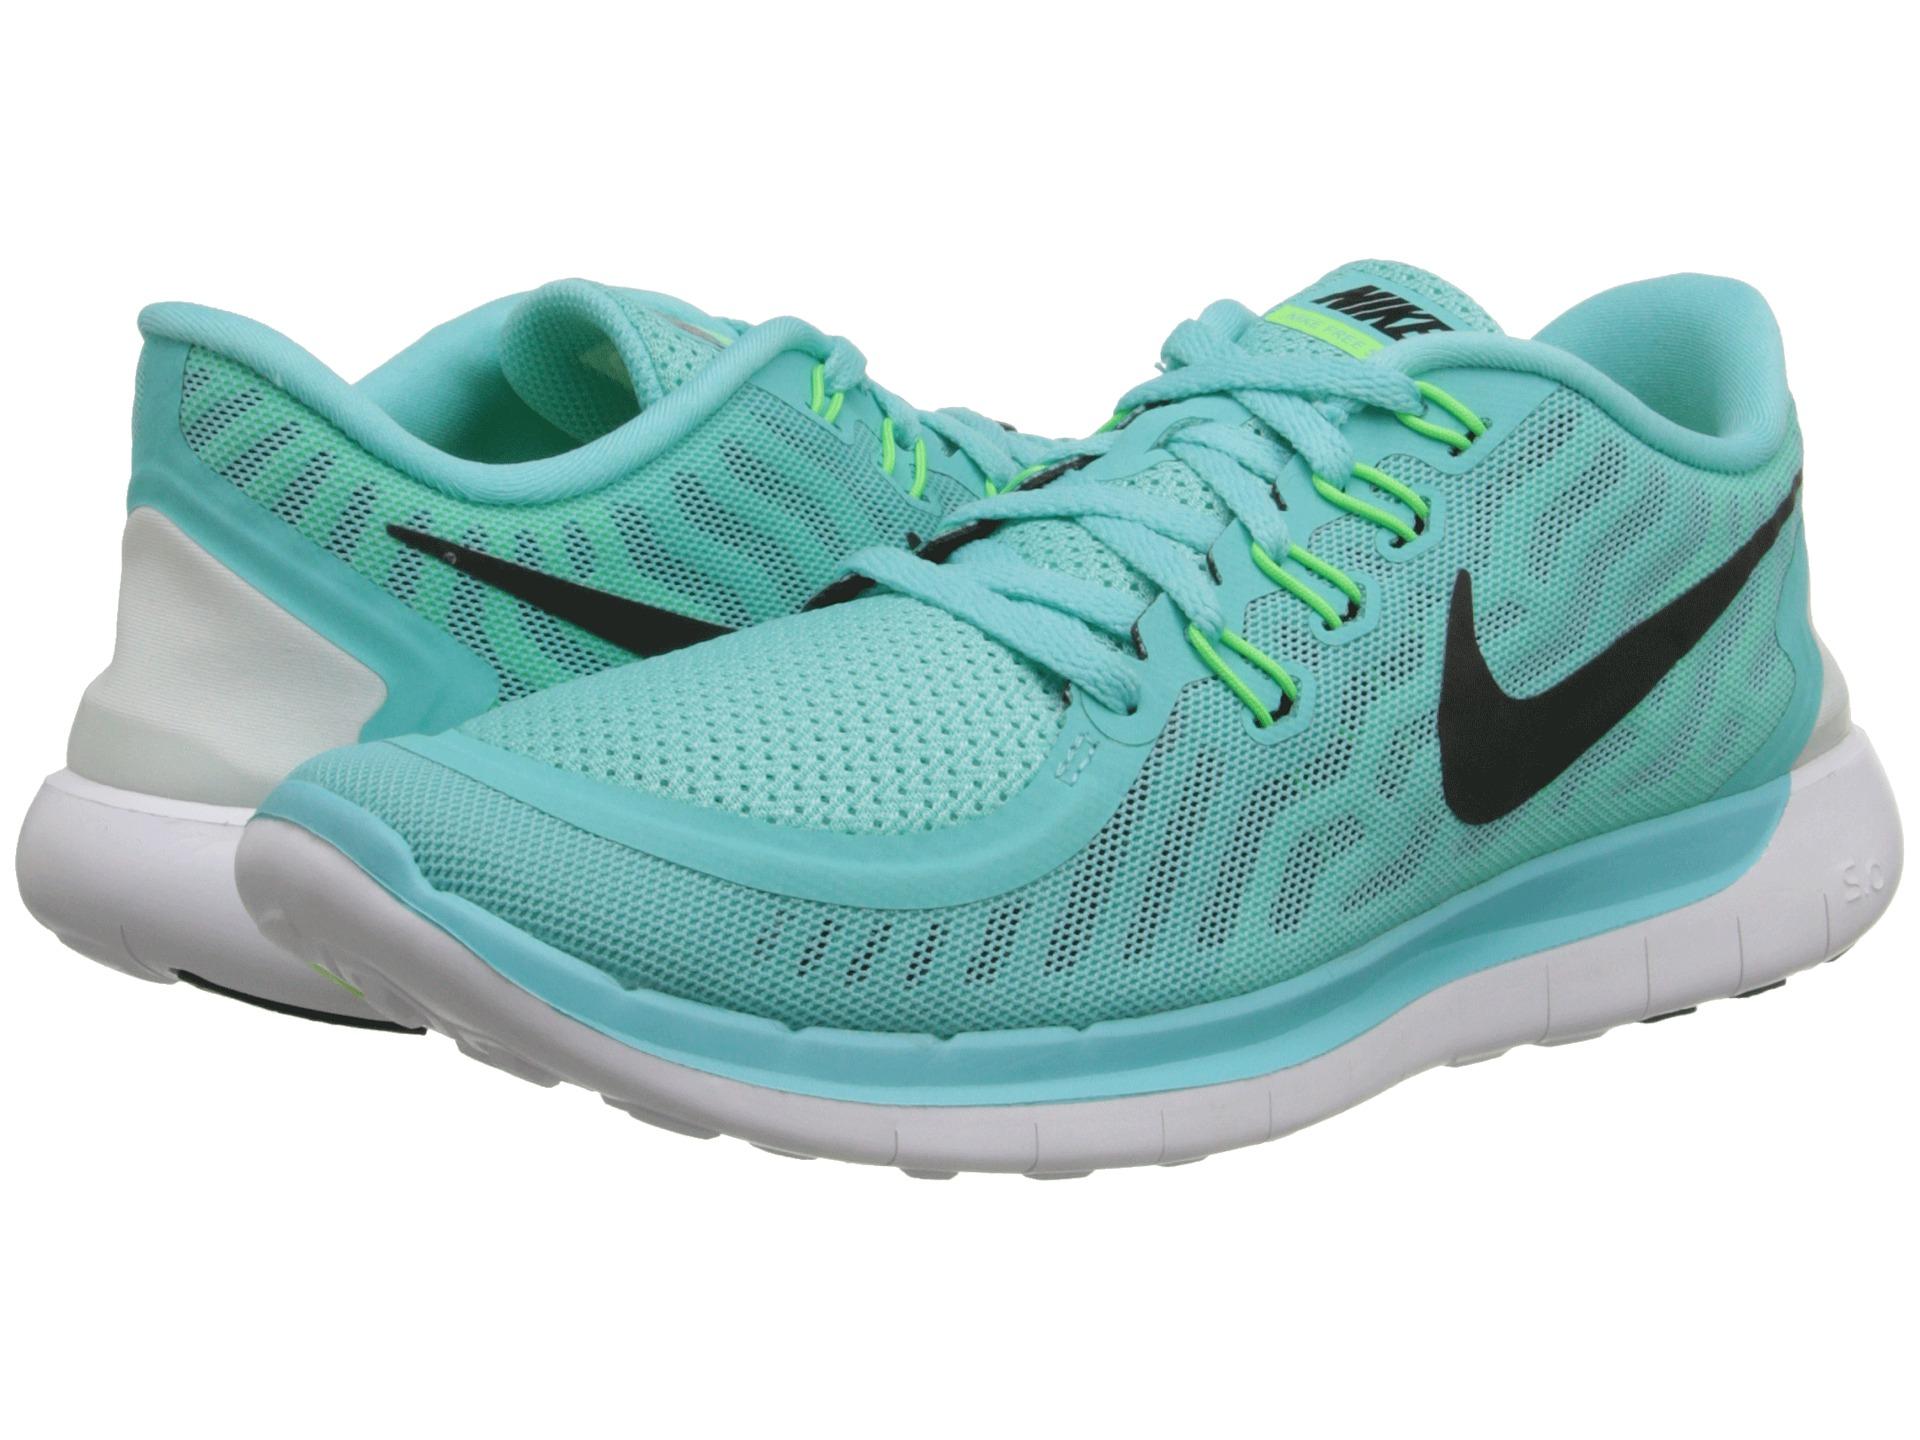 Nike Barefoot Tennis Shoes